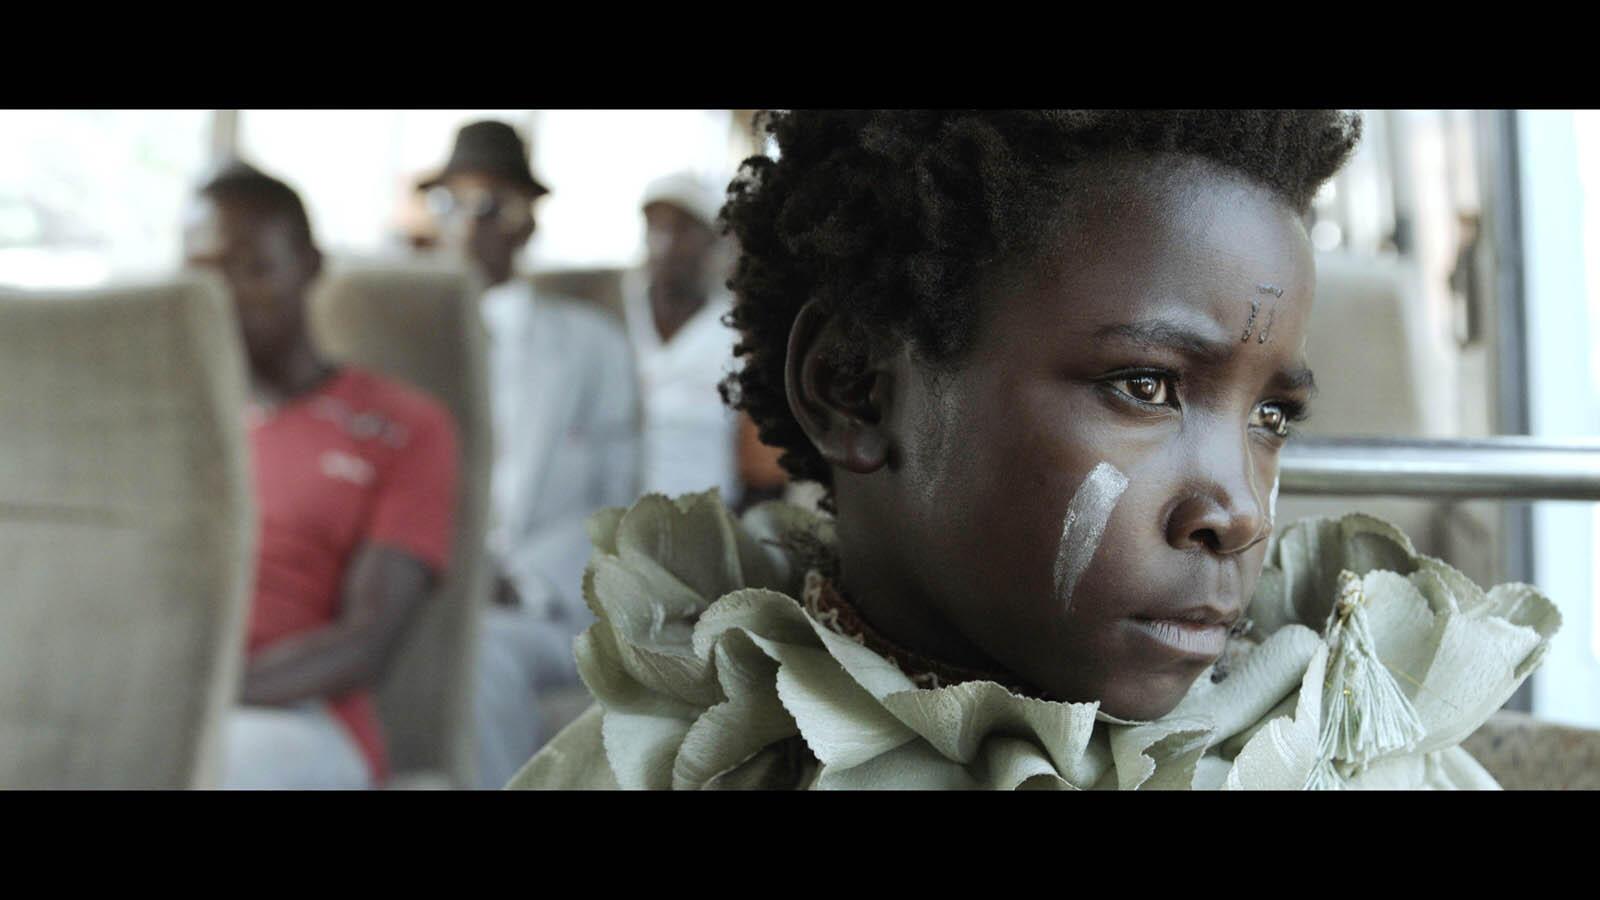 Maggie Mulubwa interprète la « sorcière » Shula dans le film «I Am Not A Witch» de Rungano Nyoni.